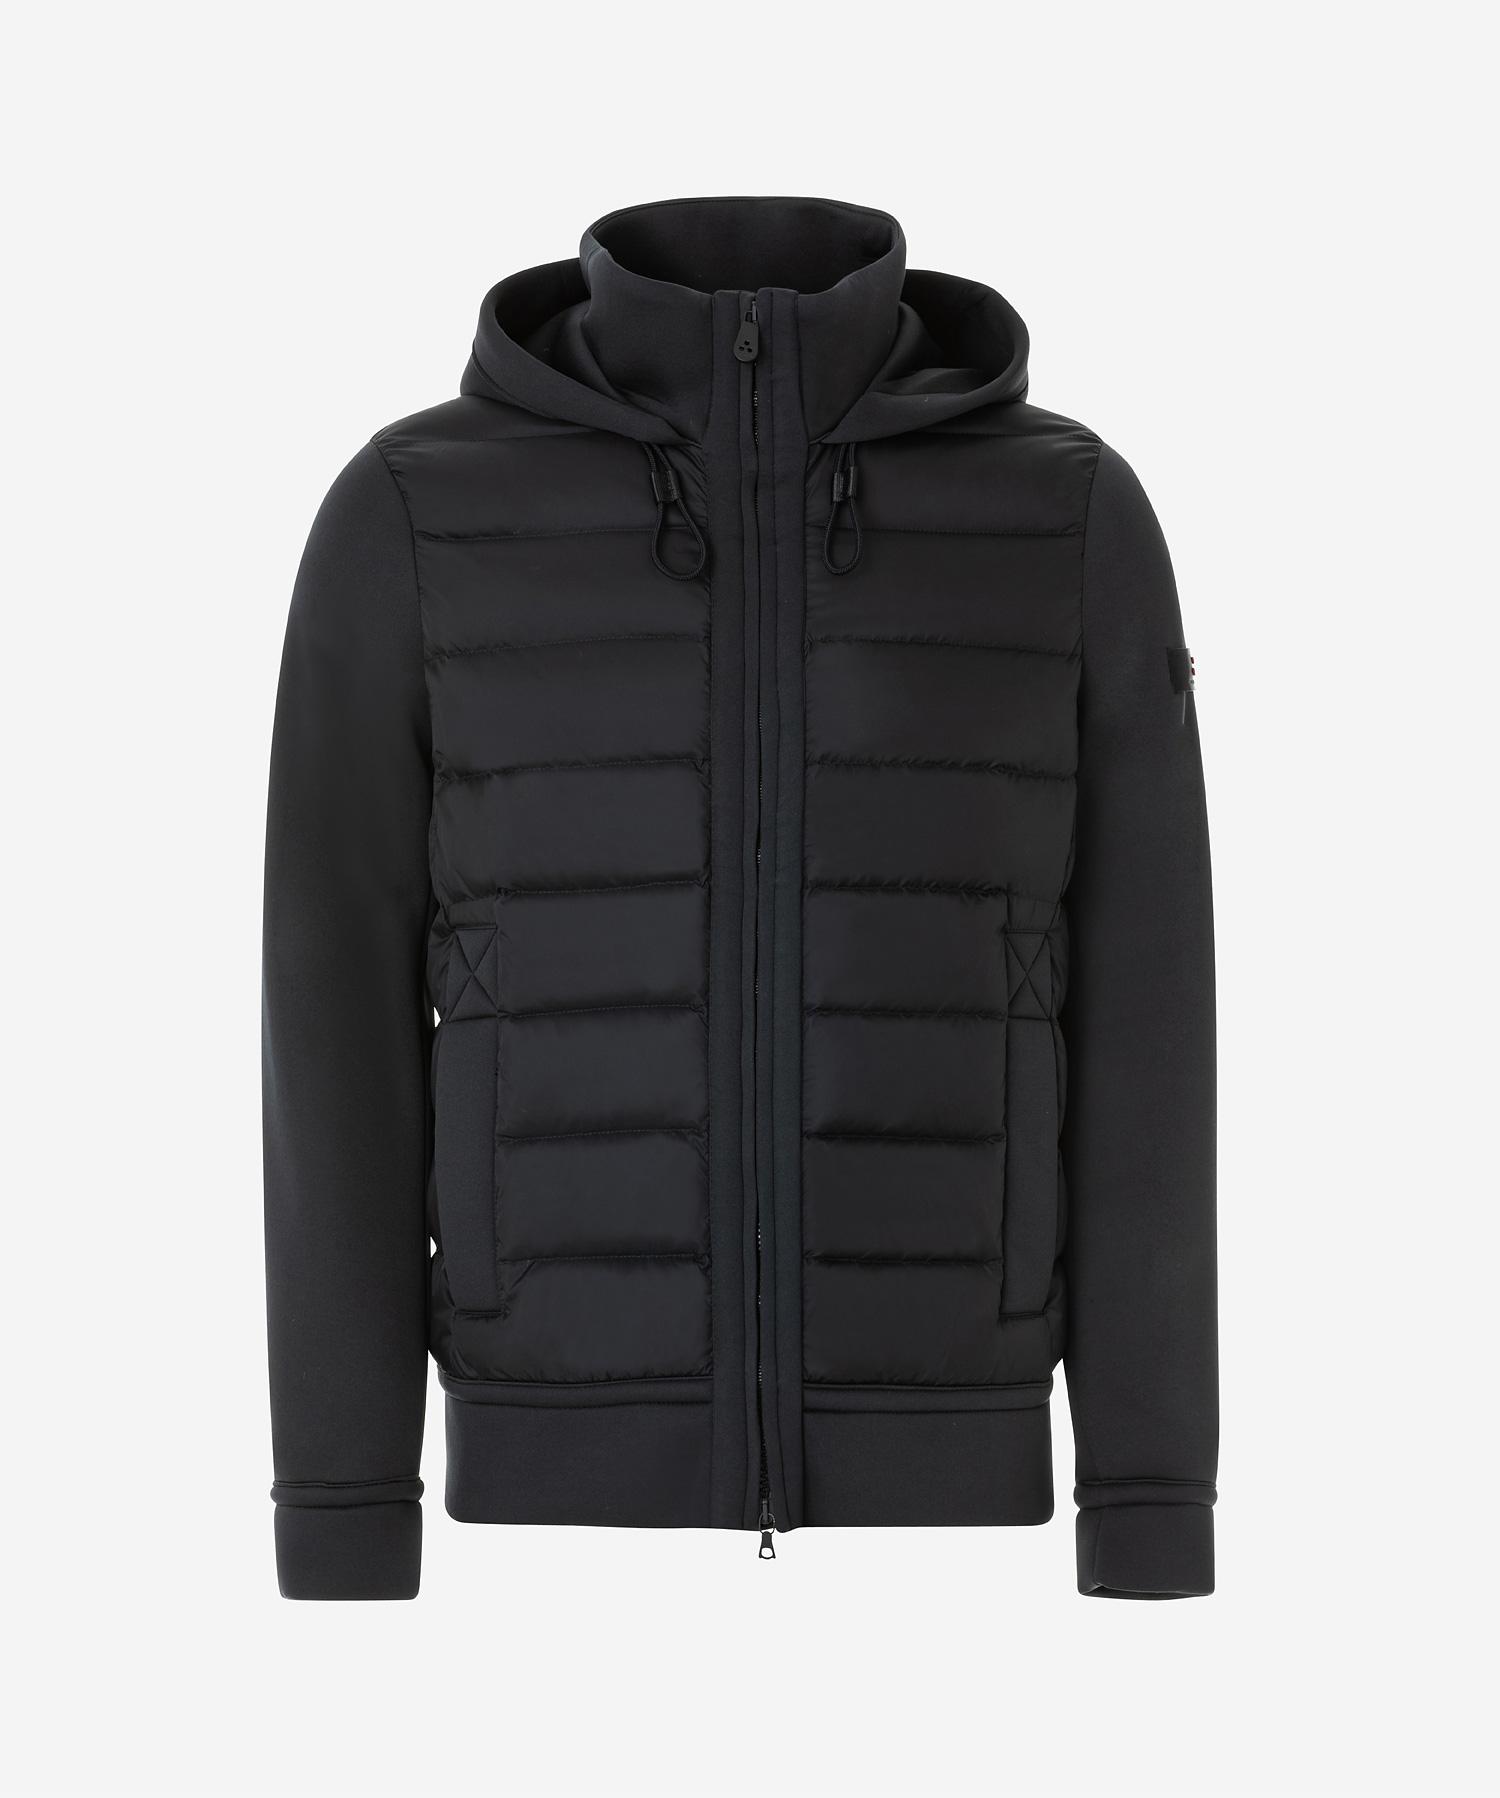 new styles 9c302 87999 Giubbotto in nylon e jersey blu Peuterey